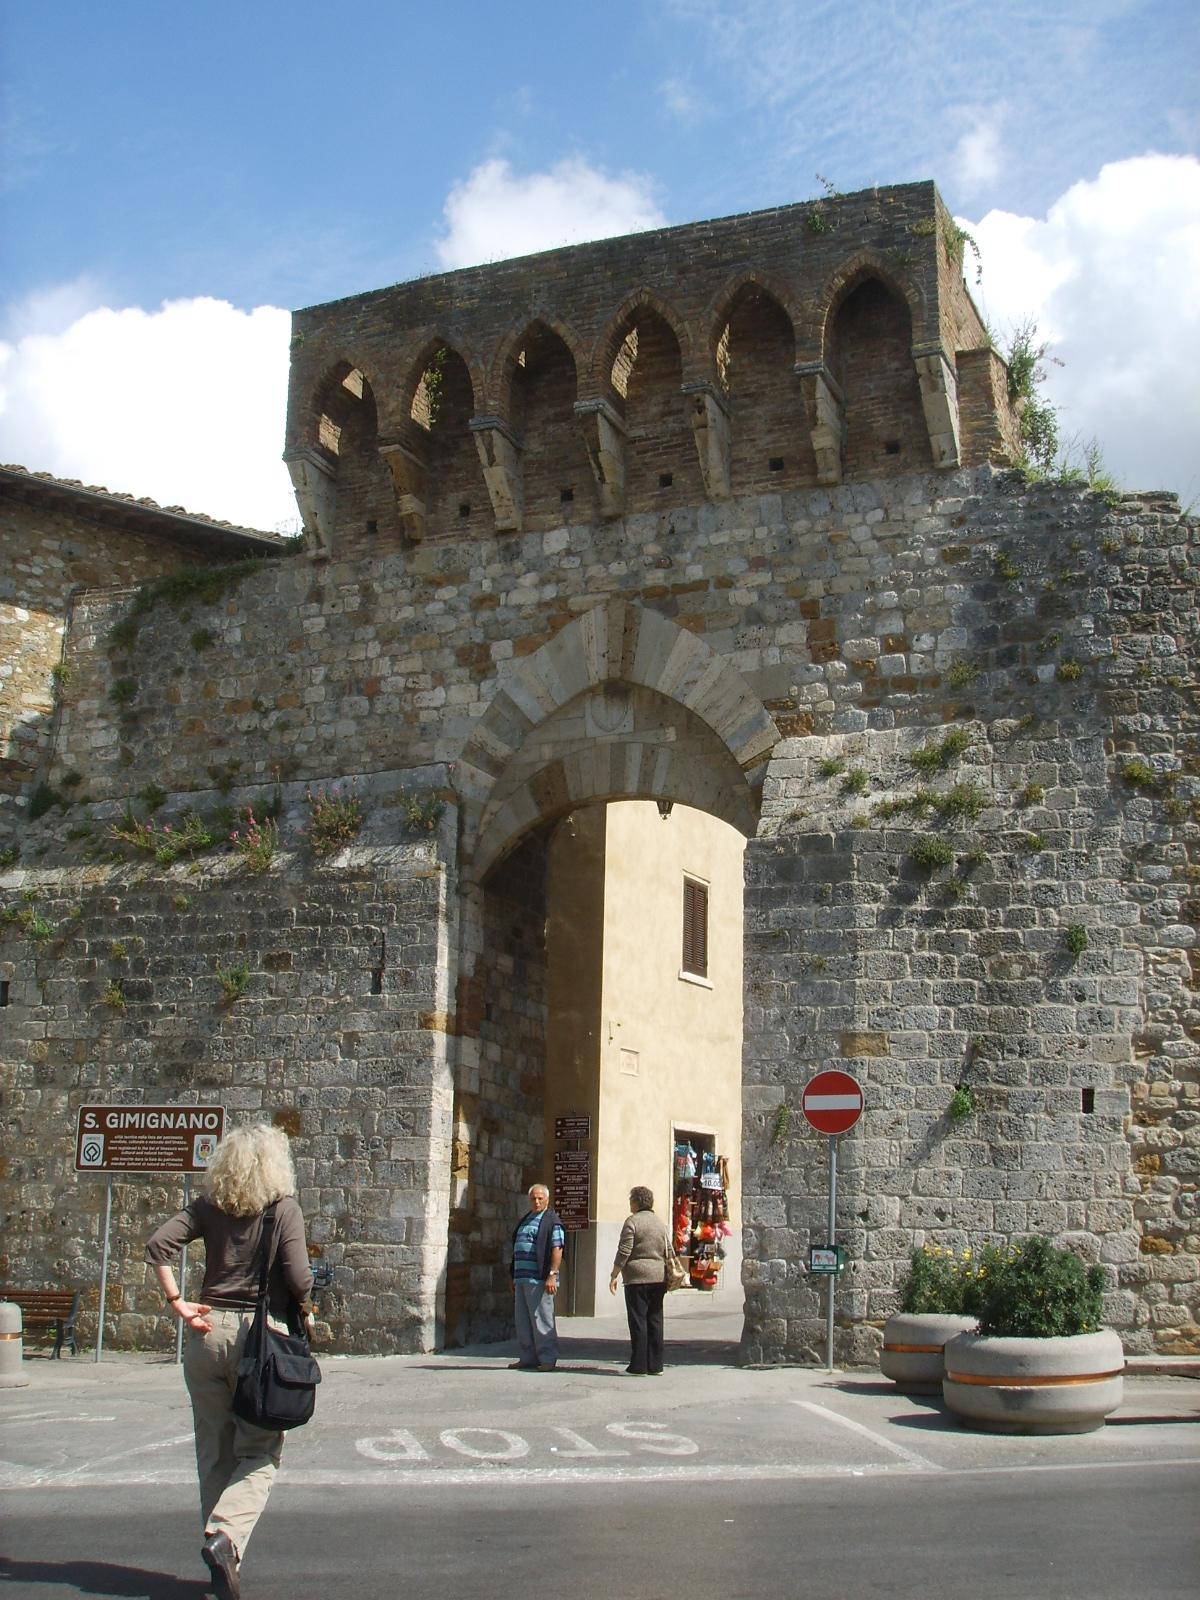 File:San gimignano, porta san matteo.JPG - Wikimedia Commons